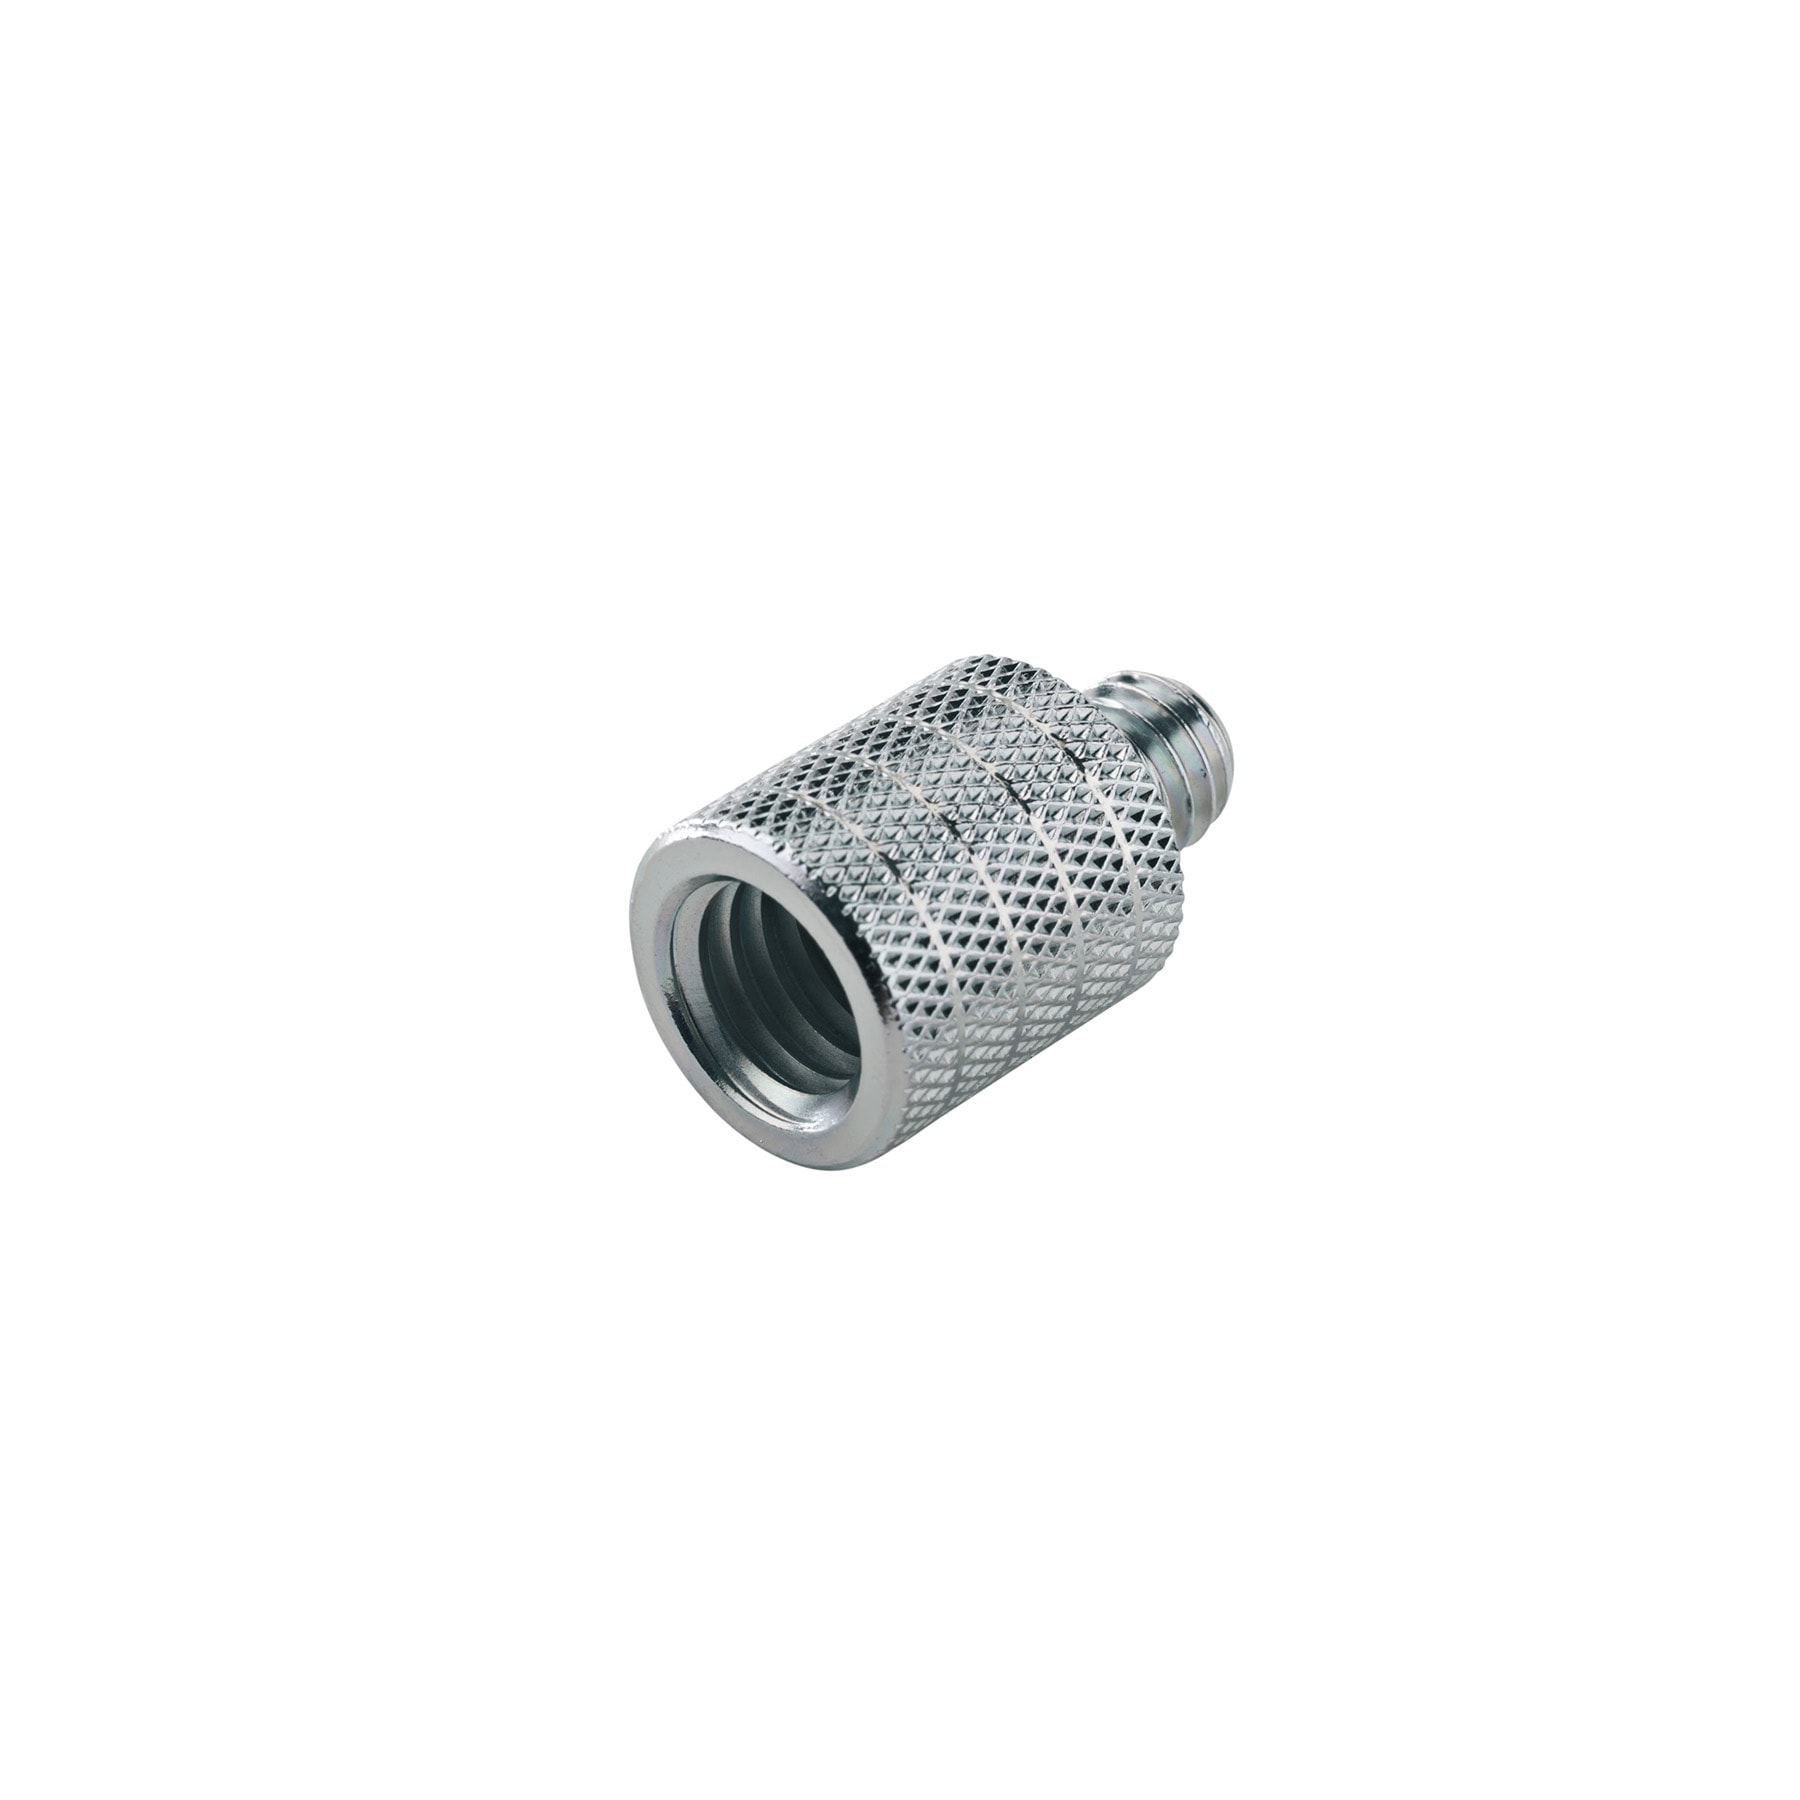 "KM21800 - Thread adapter 3/8"""" female t hread,5/8"""" 27 gauge male tr"